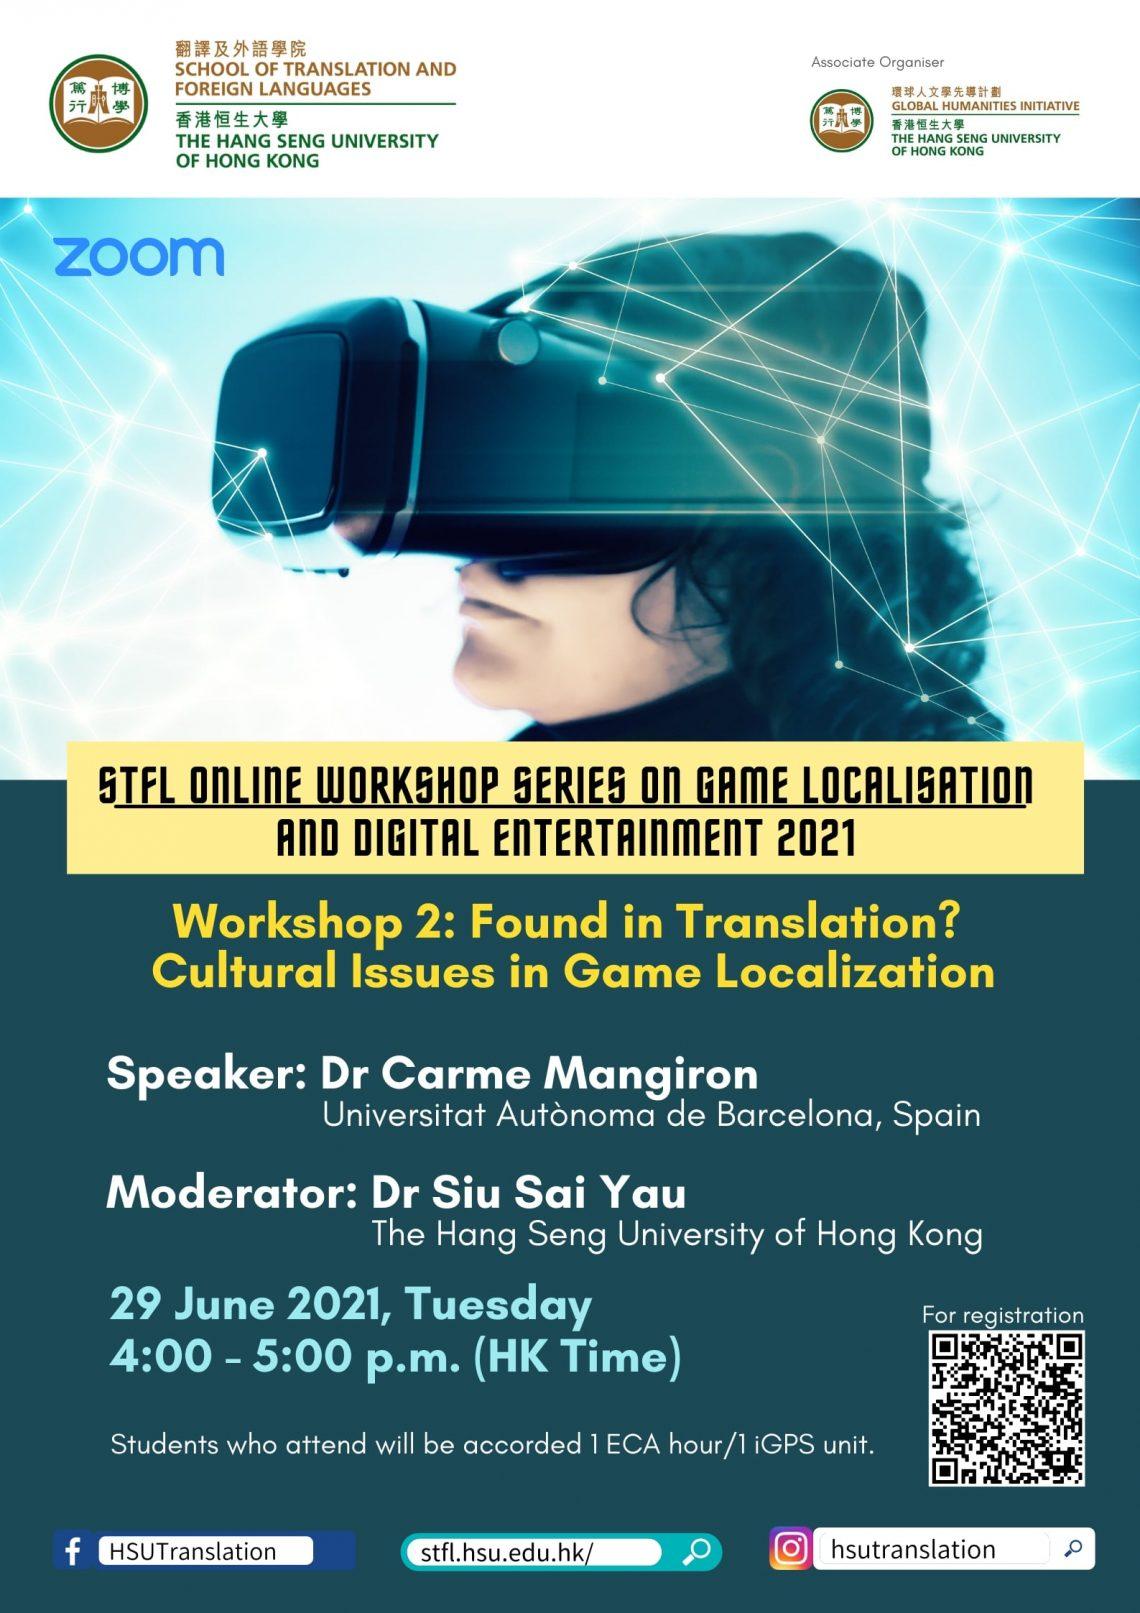 [STFL Online Workshop Series on Game Localisation and Digital Entertainment 2021] Workshop 2